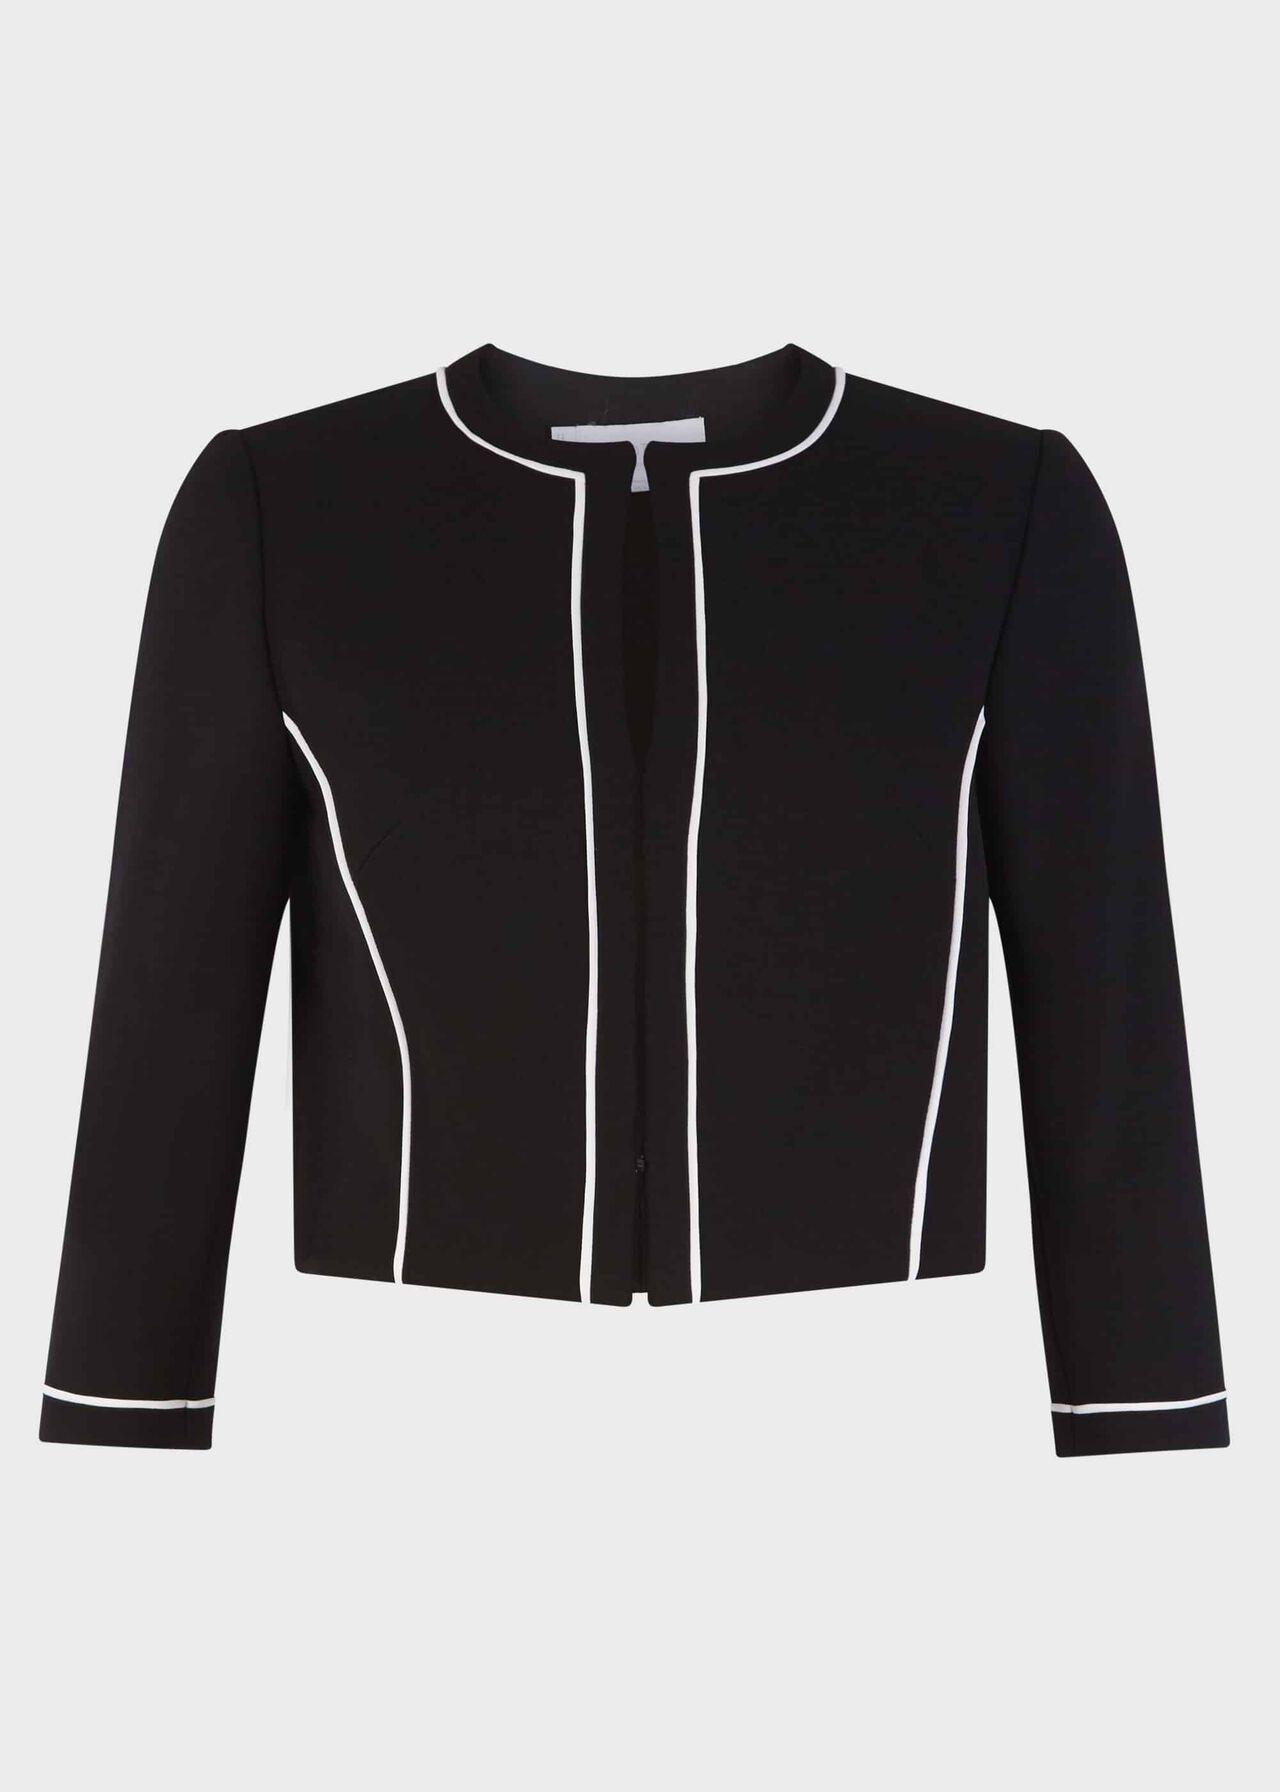 Petite Cordelia Jacket Black Ivory